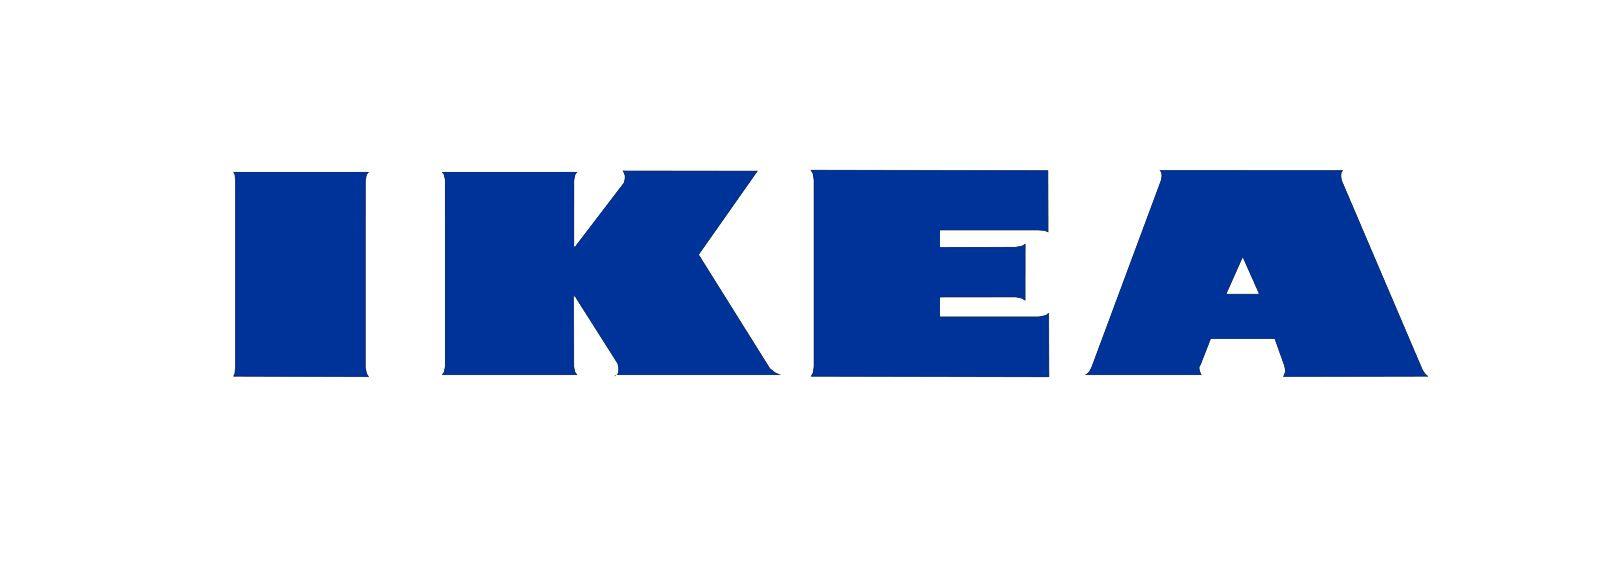 IKEA Logo, IKEA Symbol Meaning, History and Evolution | Ikea coupon, Ikea  logo, Ikea gift card